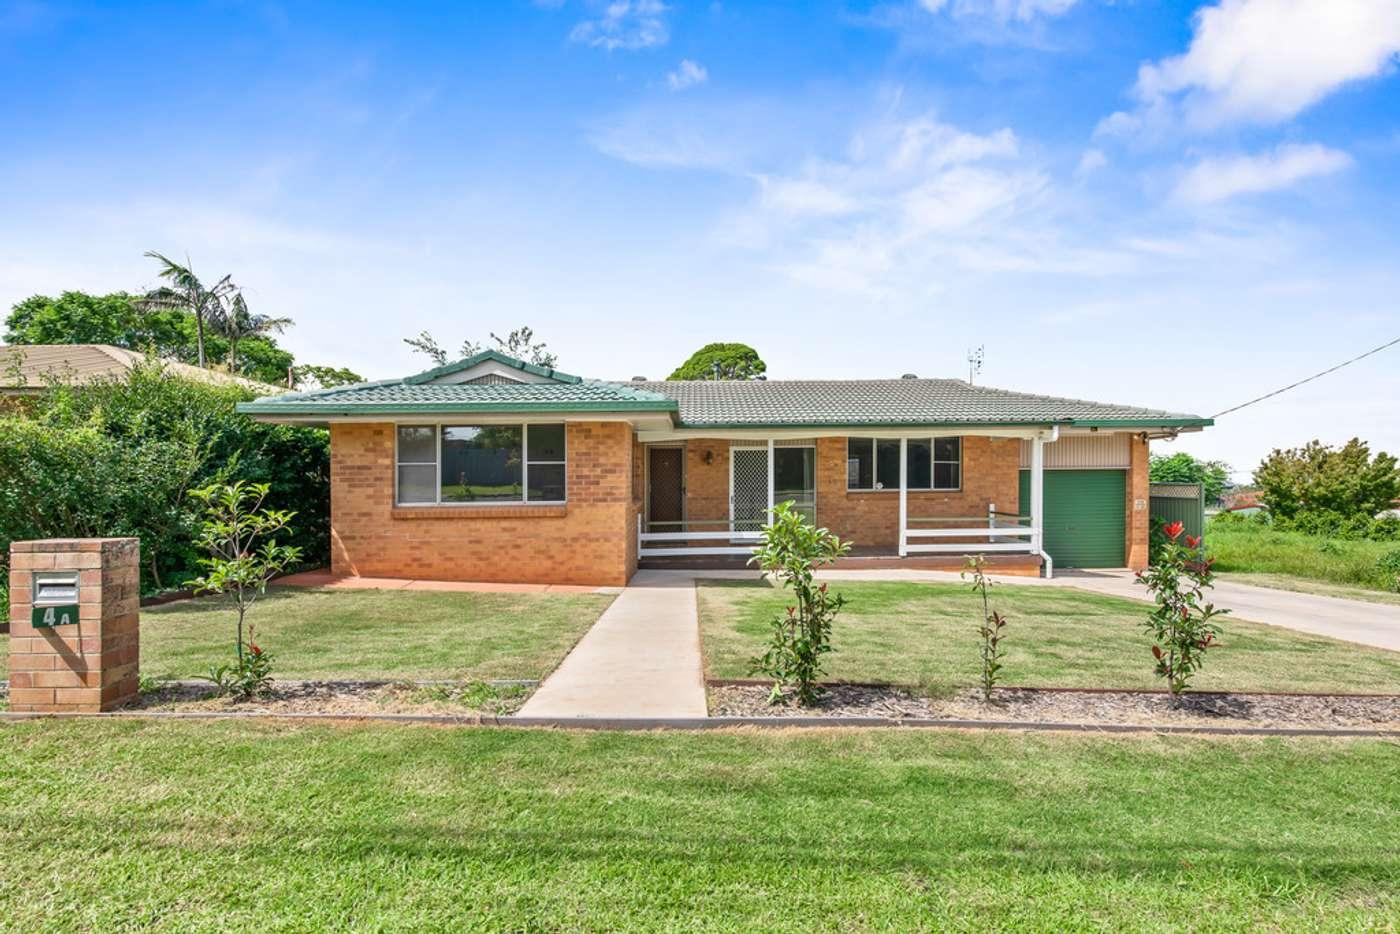 Main view of Homely house listing, 4A Bingara Street, Mount Lofty QLD 4350